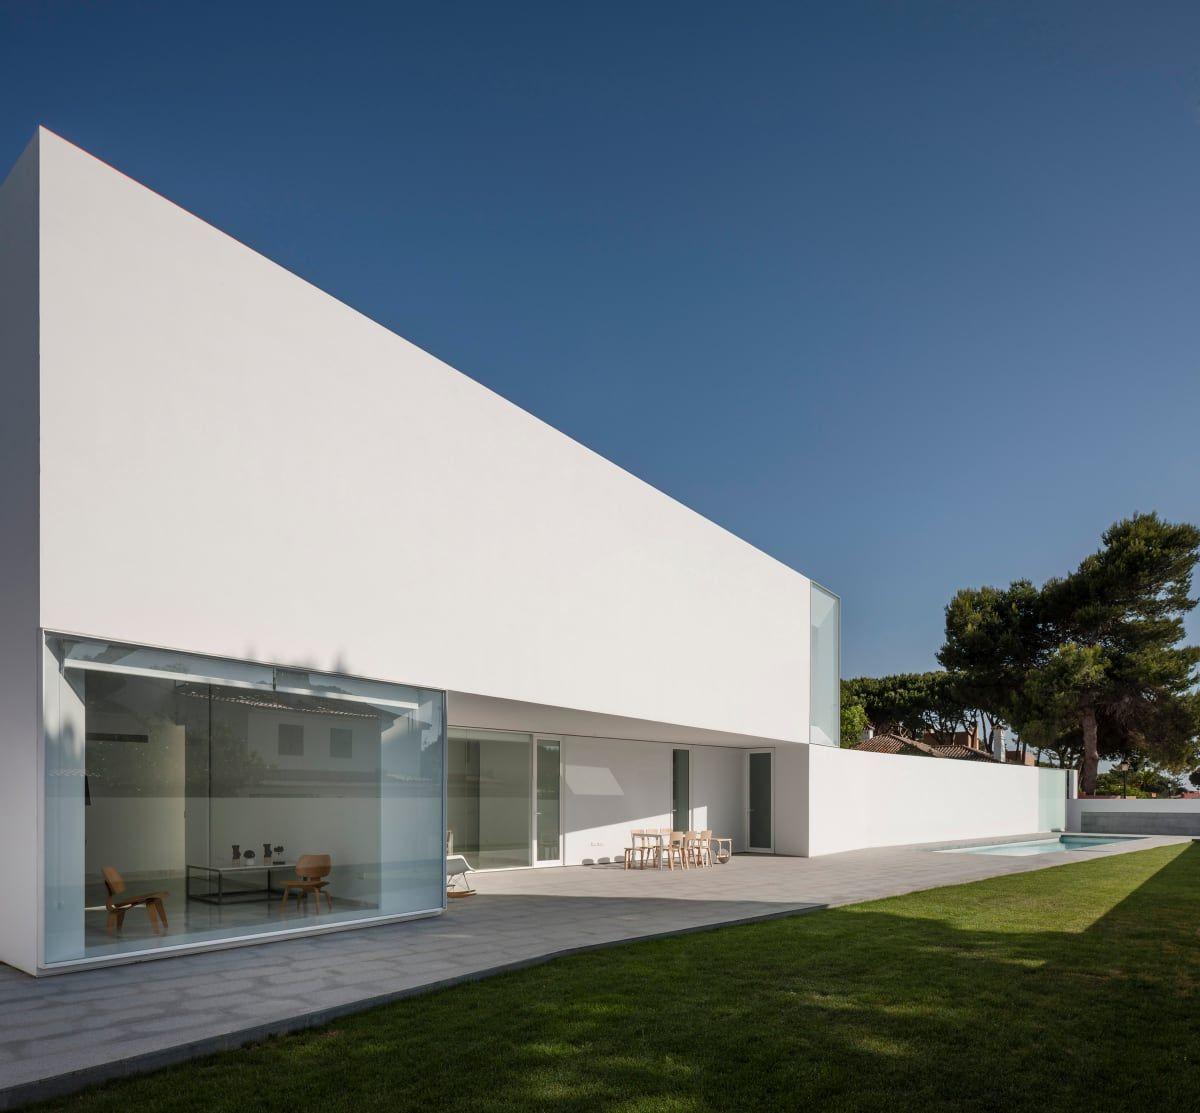 Adolfo prez fernando alda star 18 be best pinterest house house sciox Choice Image